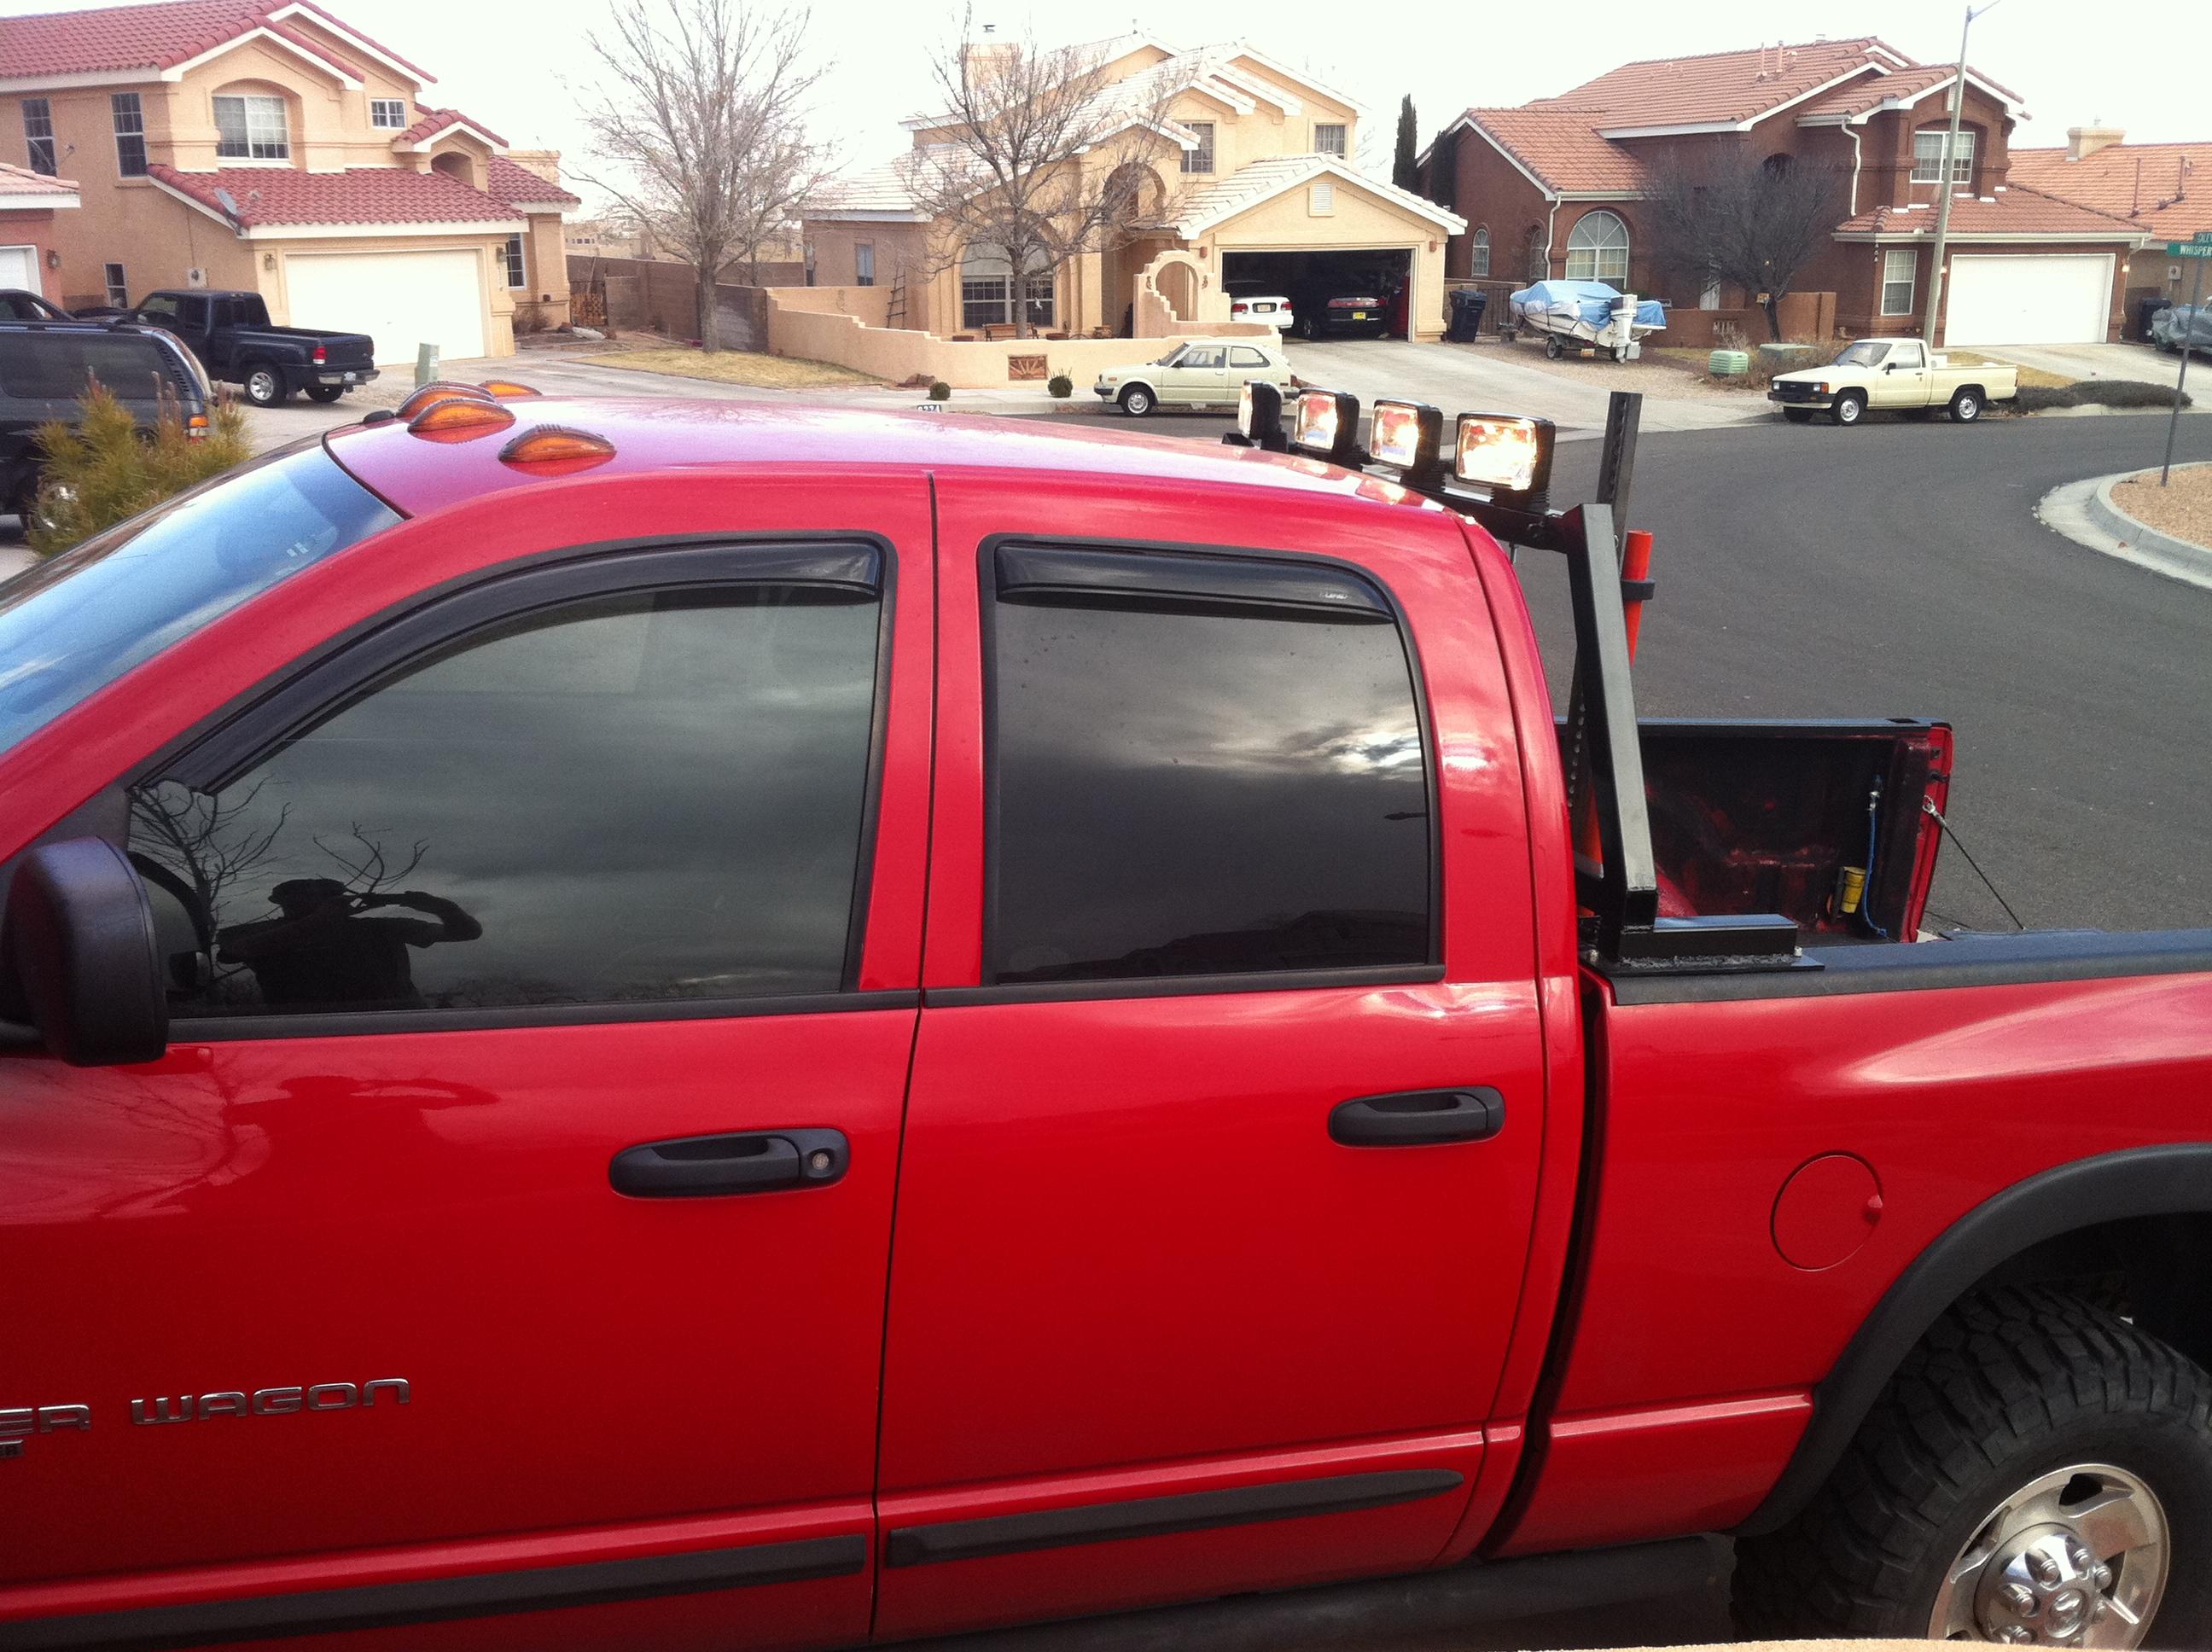 Pcwize Com Truckhacks Rotating Headache Rack Lightbar